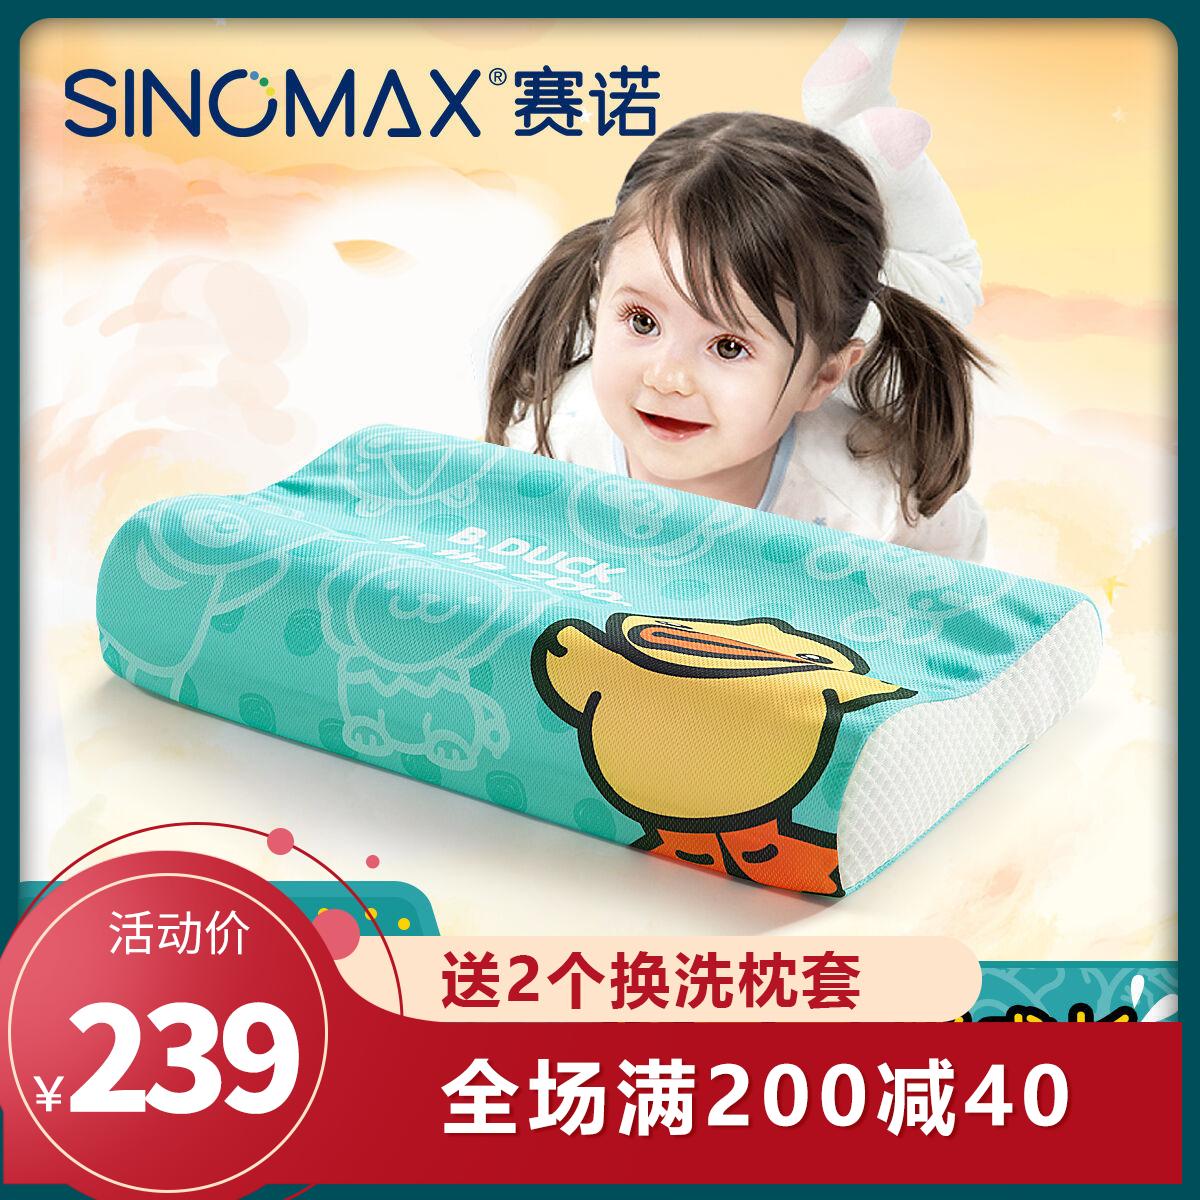 SINOMAX/赛诺B.Duck 小黄鸭校园儿童枕三层慢回弹记忆棉学生枕头